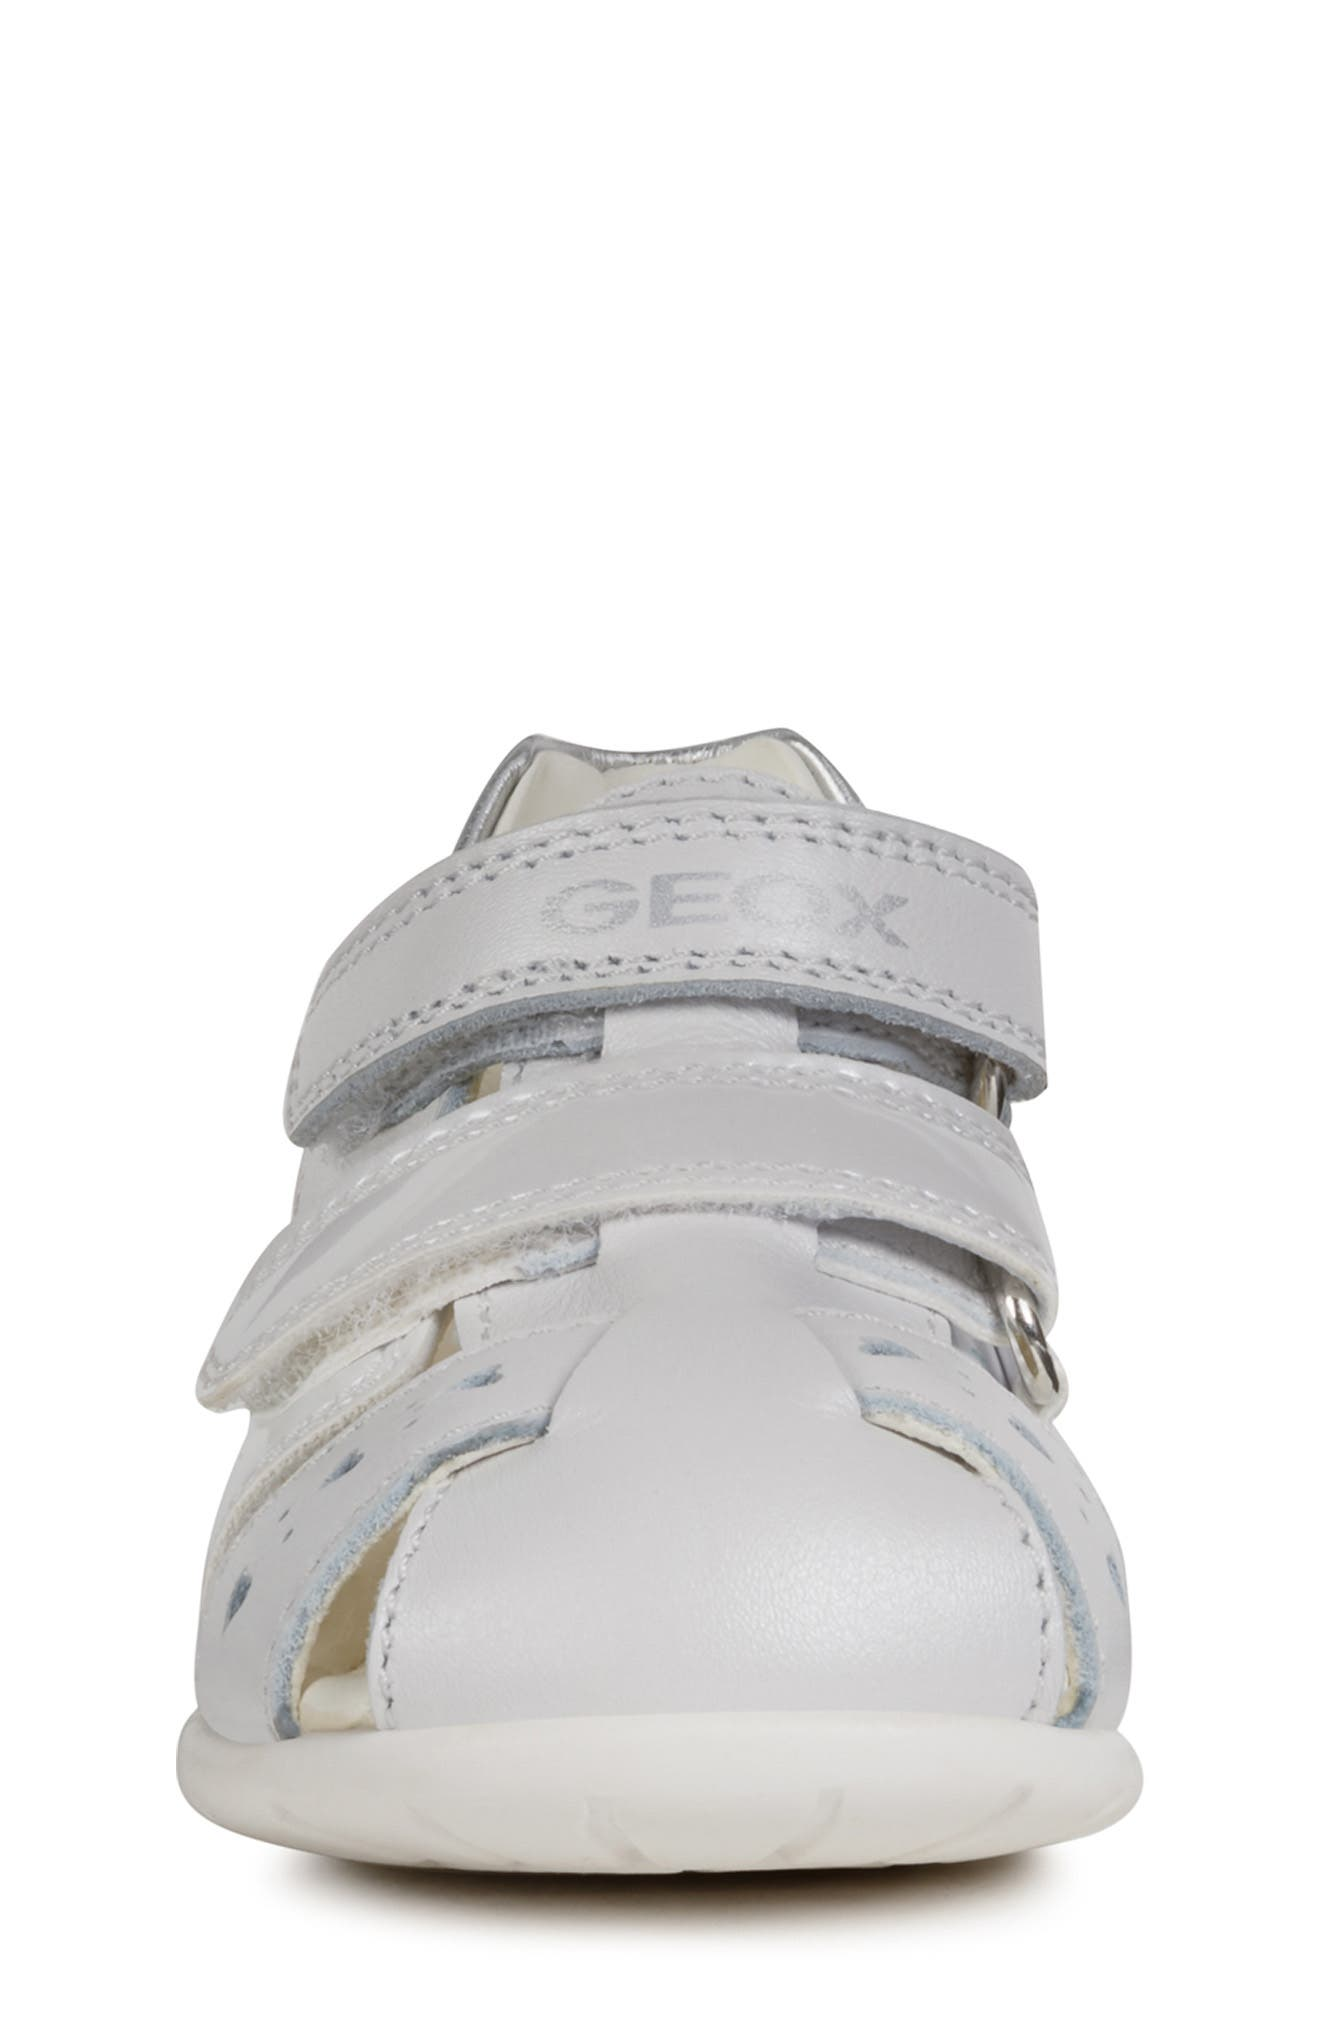 GEOX,                             Kaytan 52 Shimmery Sandal,                             Alternate thumbnail 4, color,                             WHITE/ SILVER